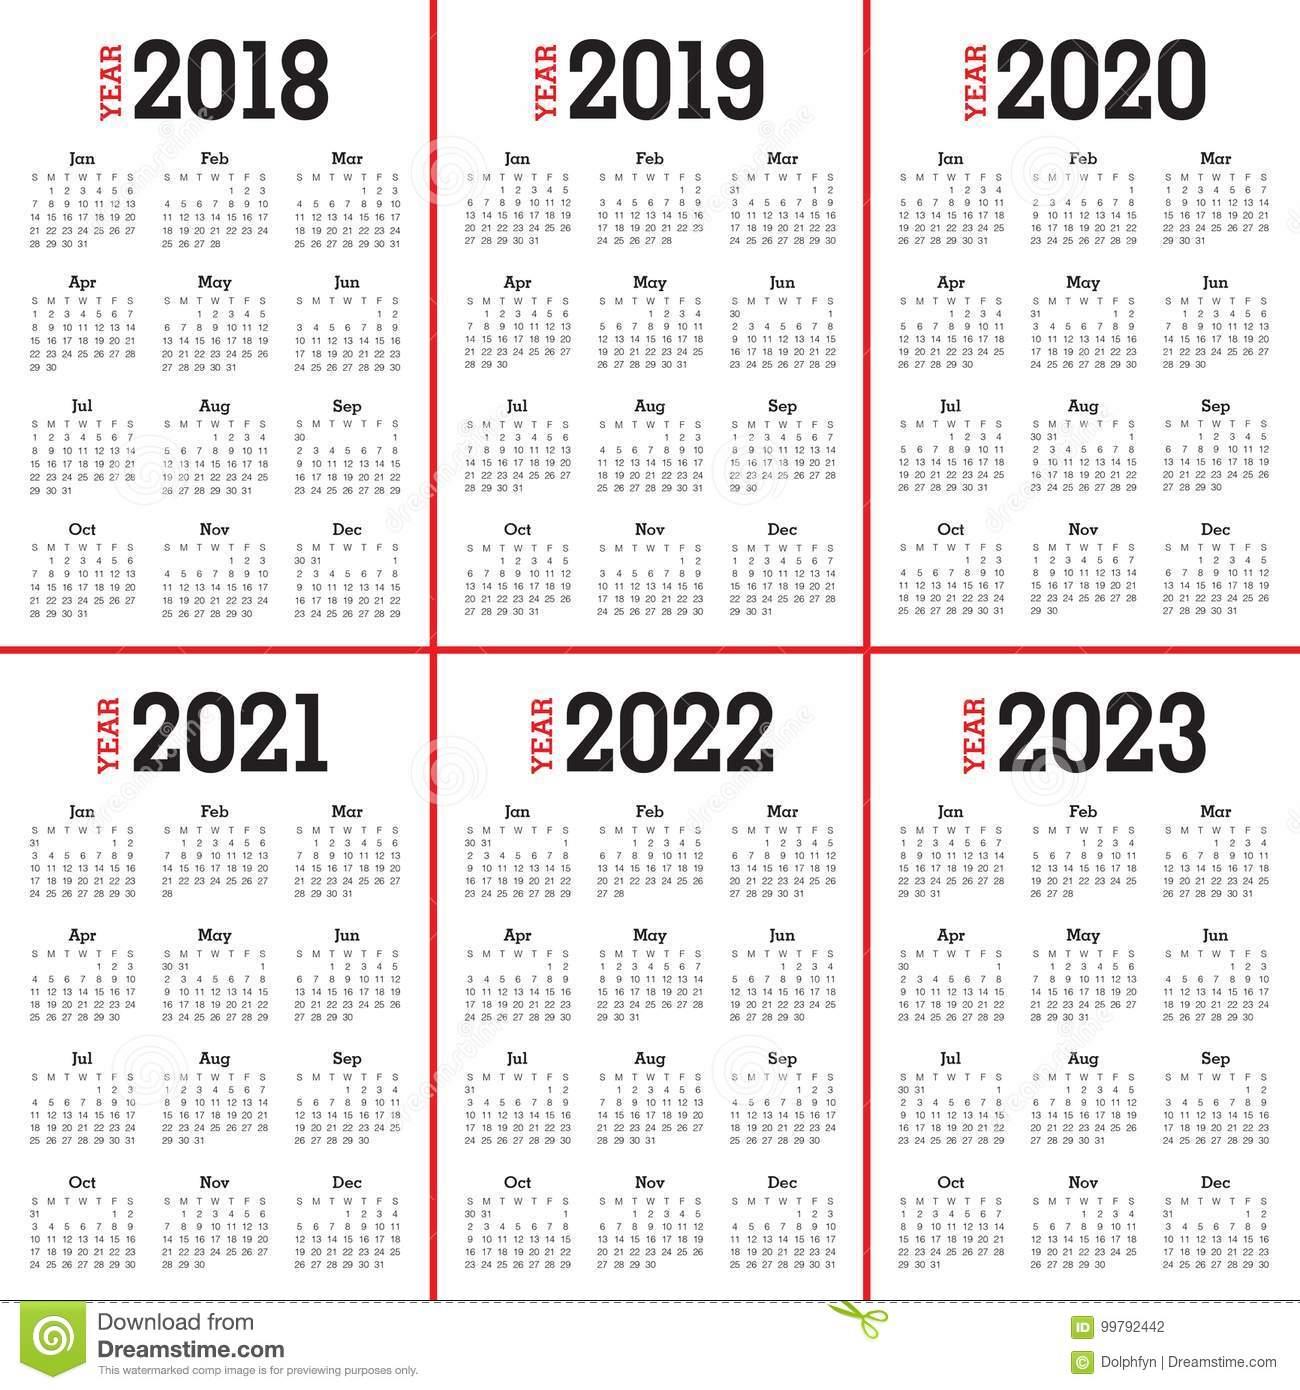 Year 2018 2019 2020 2021 2022 2023 Calendar Vector Stock Vector within Free Printable 3 Year Calendar 2019 2020 2021